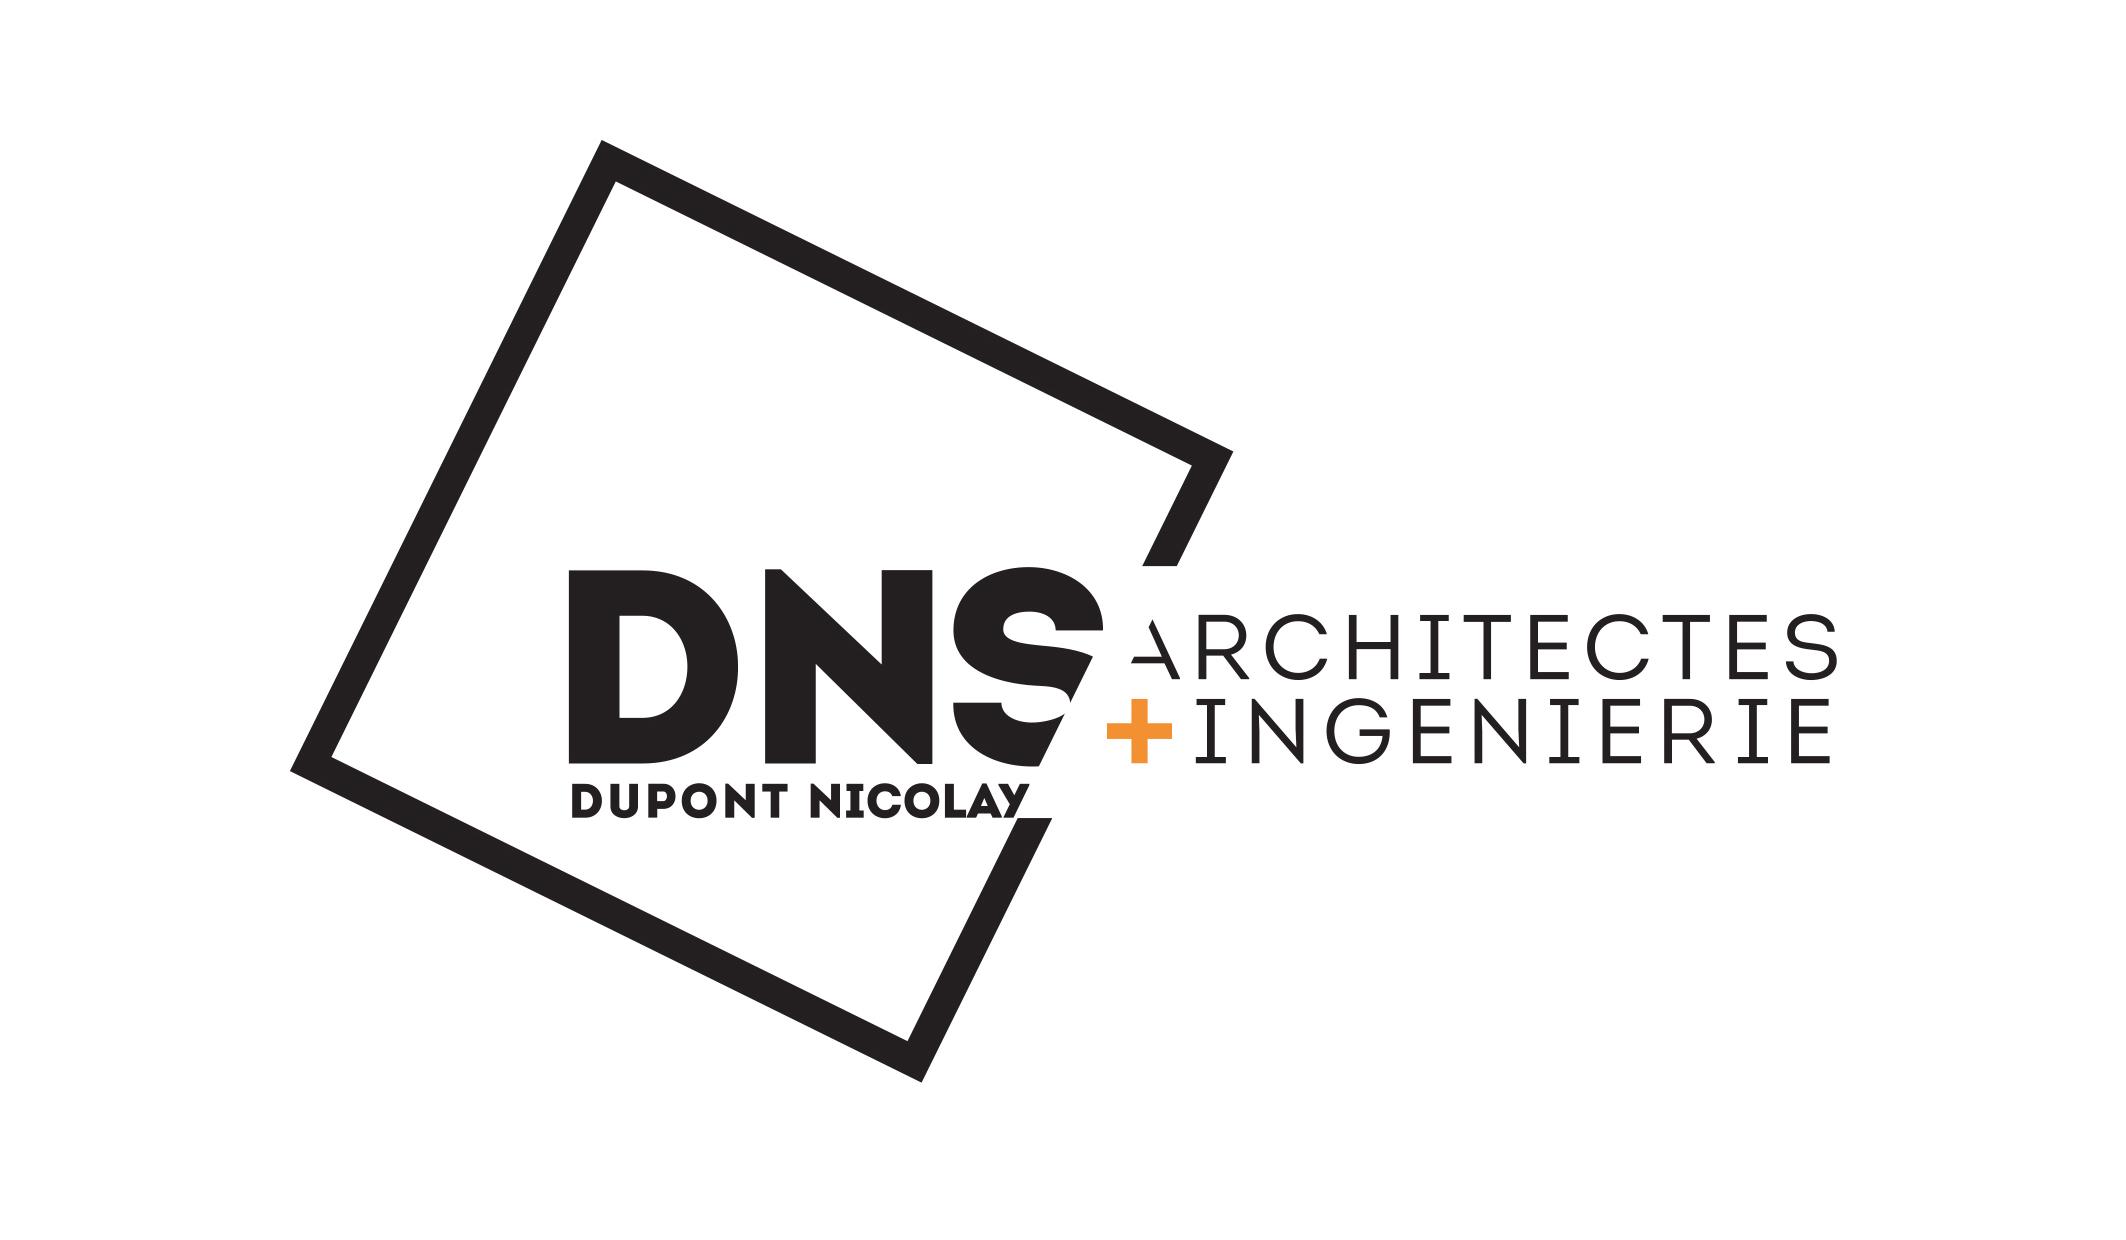 DNS Dupont Nicolay Architectes Ingénierie